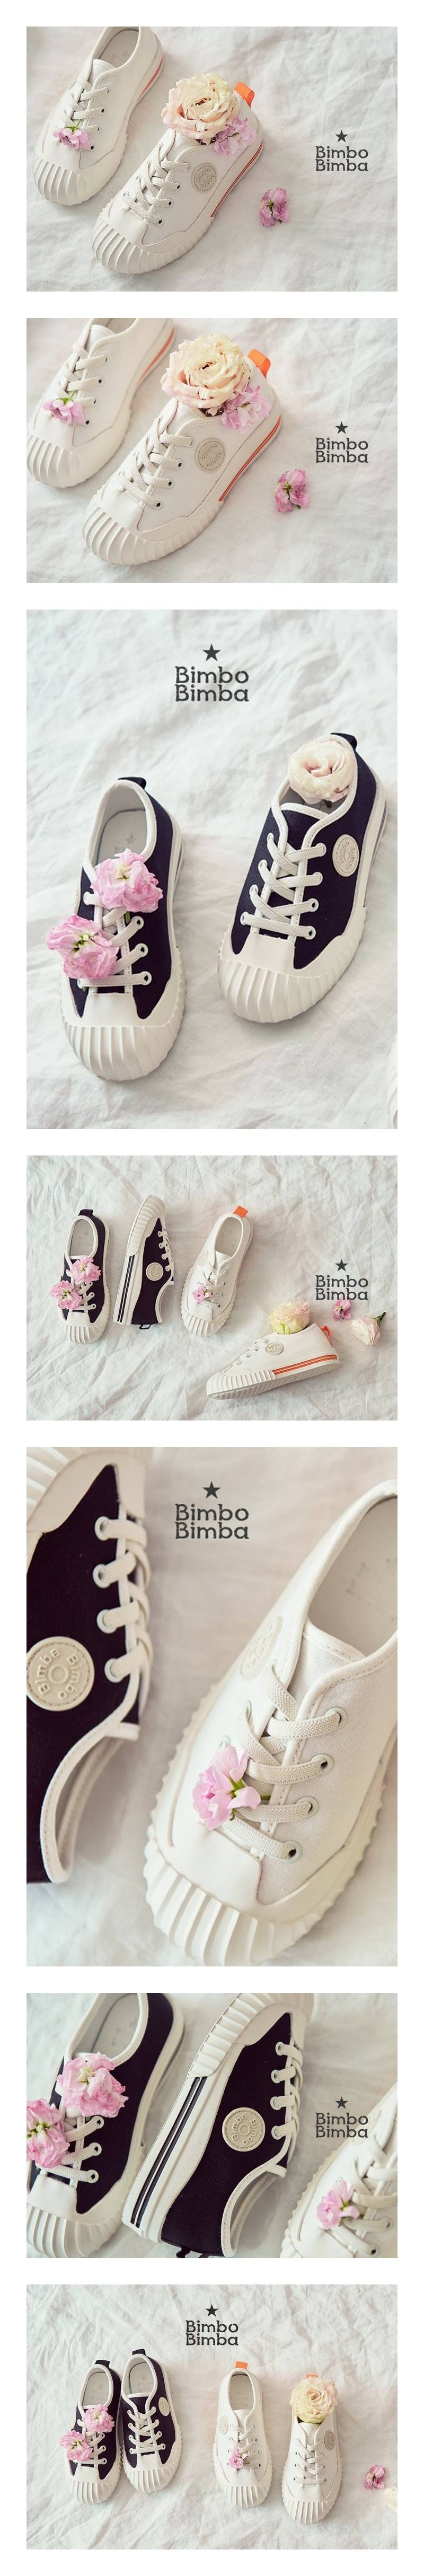 BIMBO BIMBA - Korean Children Fashion - #Kfashion4kids - Synthis Sneakers